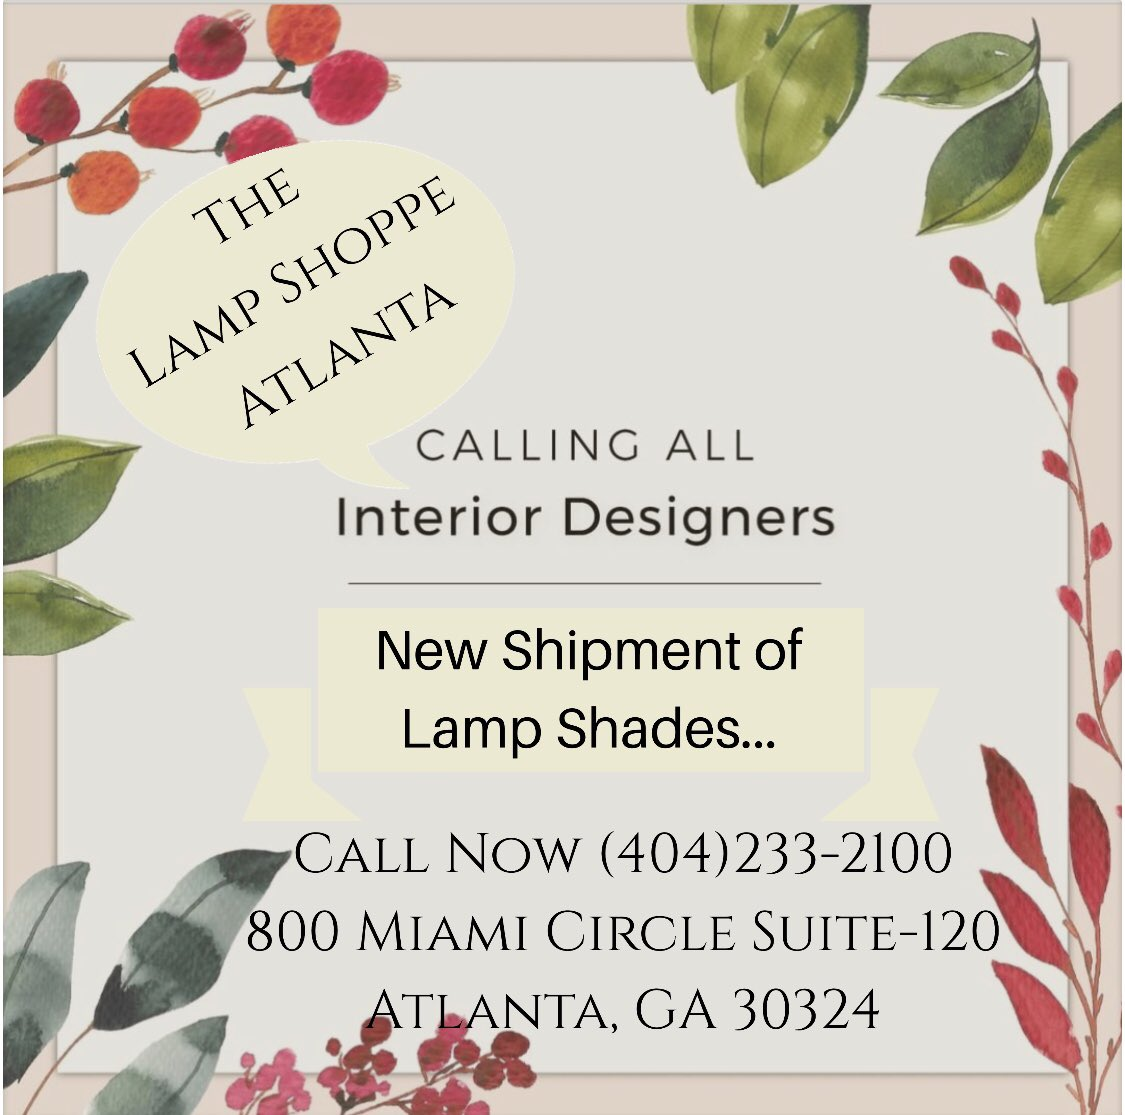 Lamp shades atlanta lampshadesatl twitter 0 replies 0 retweets 0 likes mozeypictures Gallery